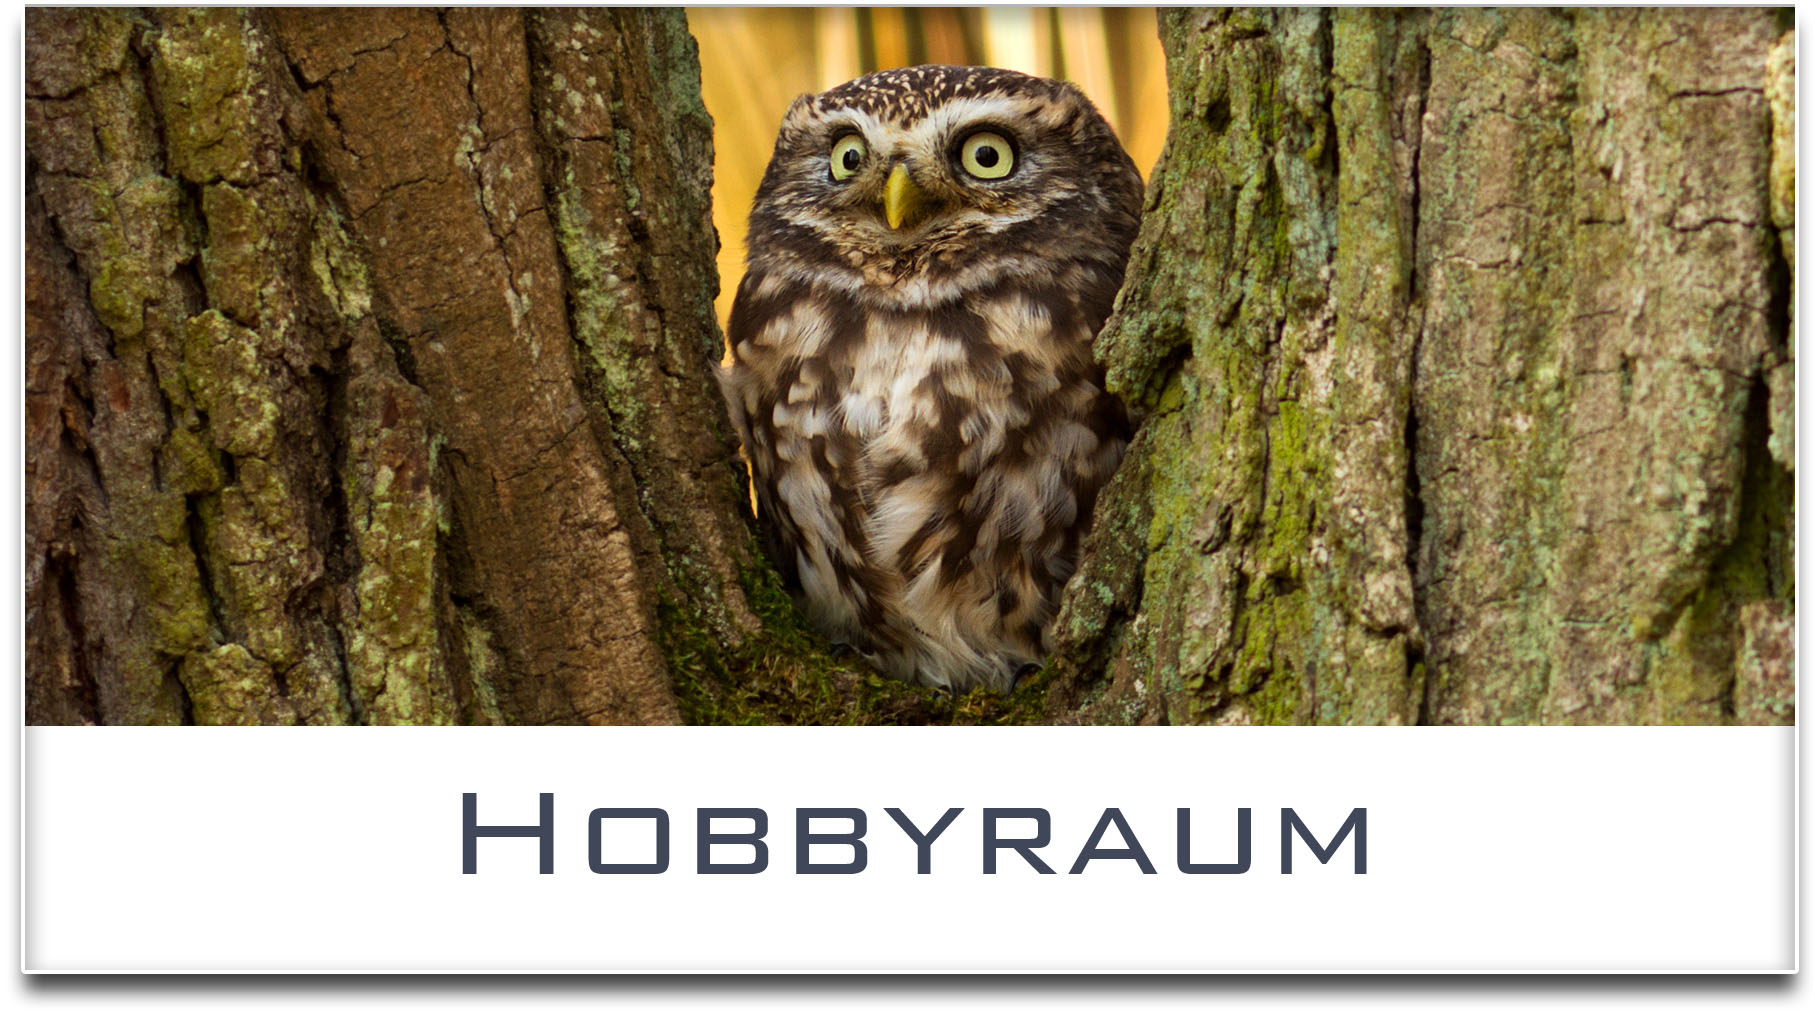 Türschild / Haustürschild / Eule / Hobbyraum / Selbstklebend